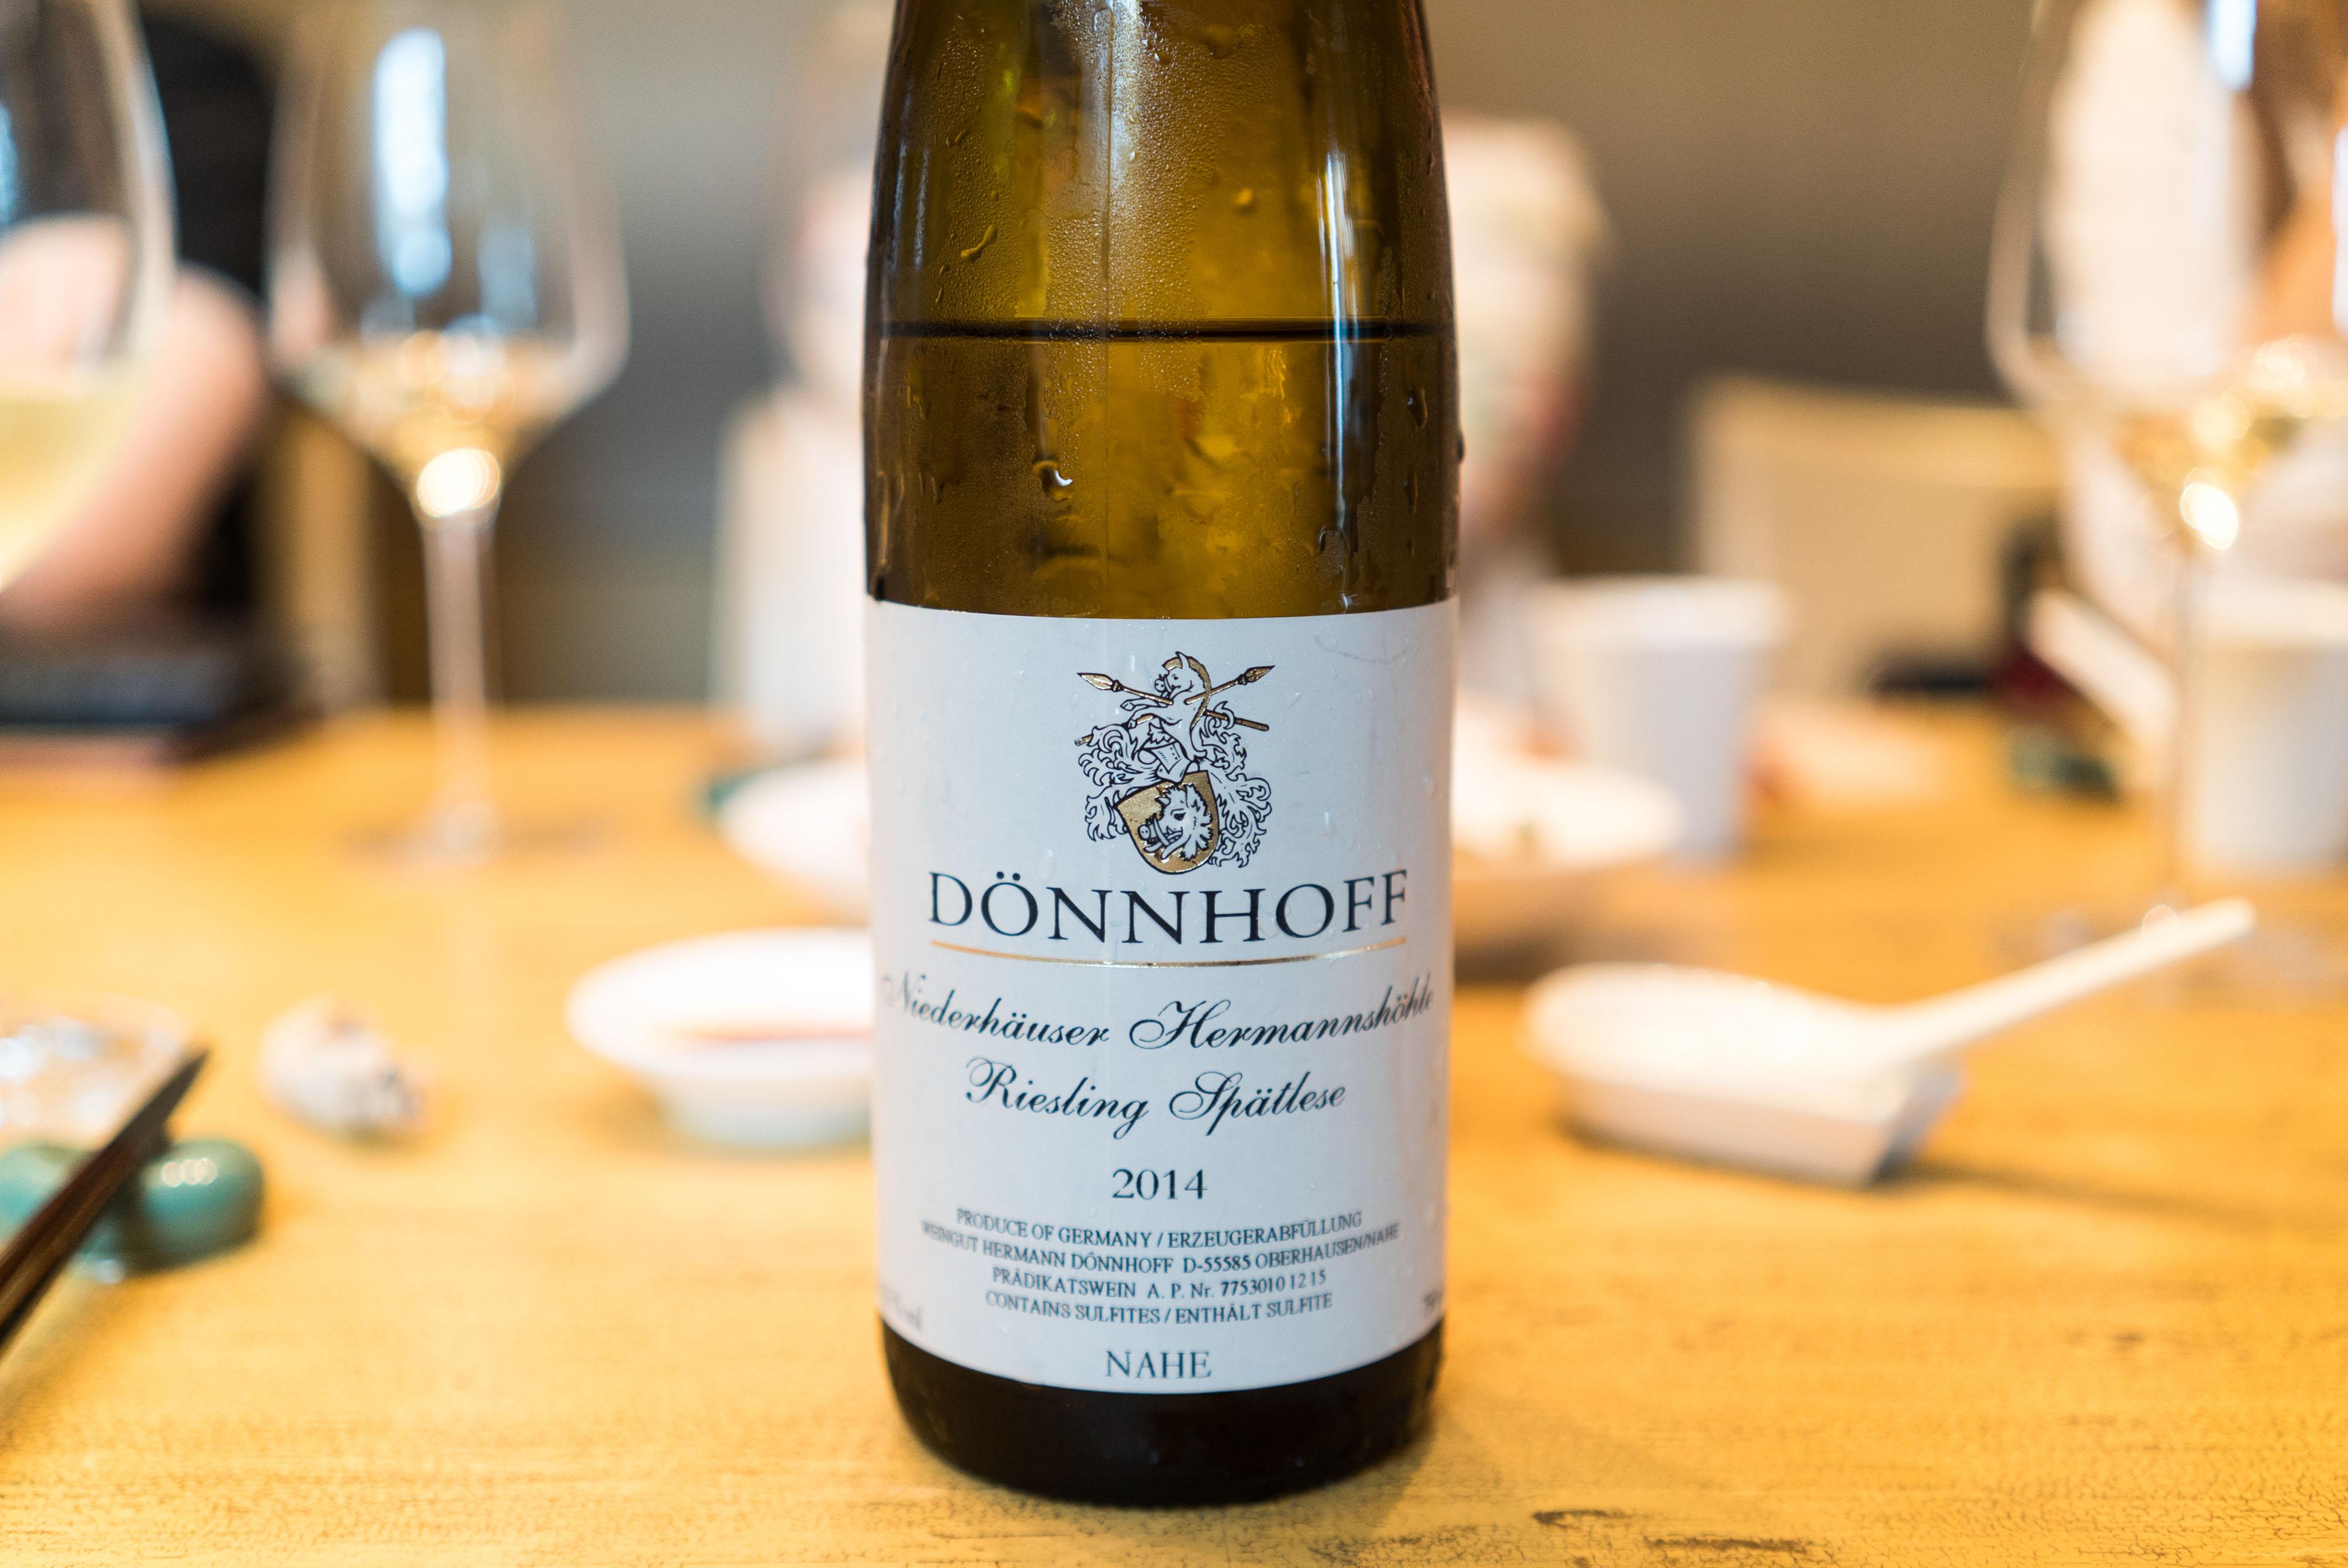 Donnhoff Norhemer Kirschheck 1er Riesling Spatlese 2014